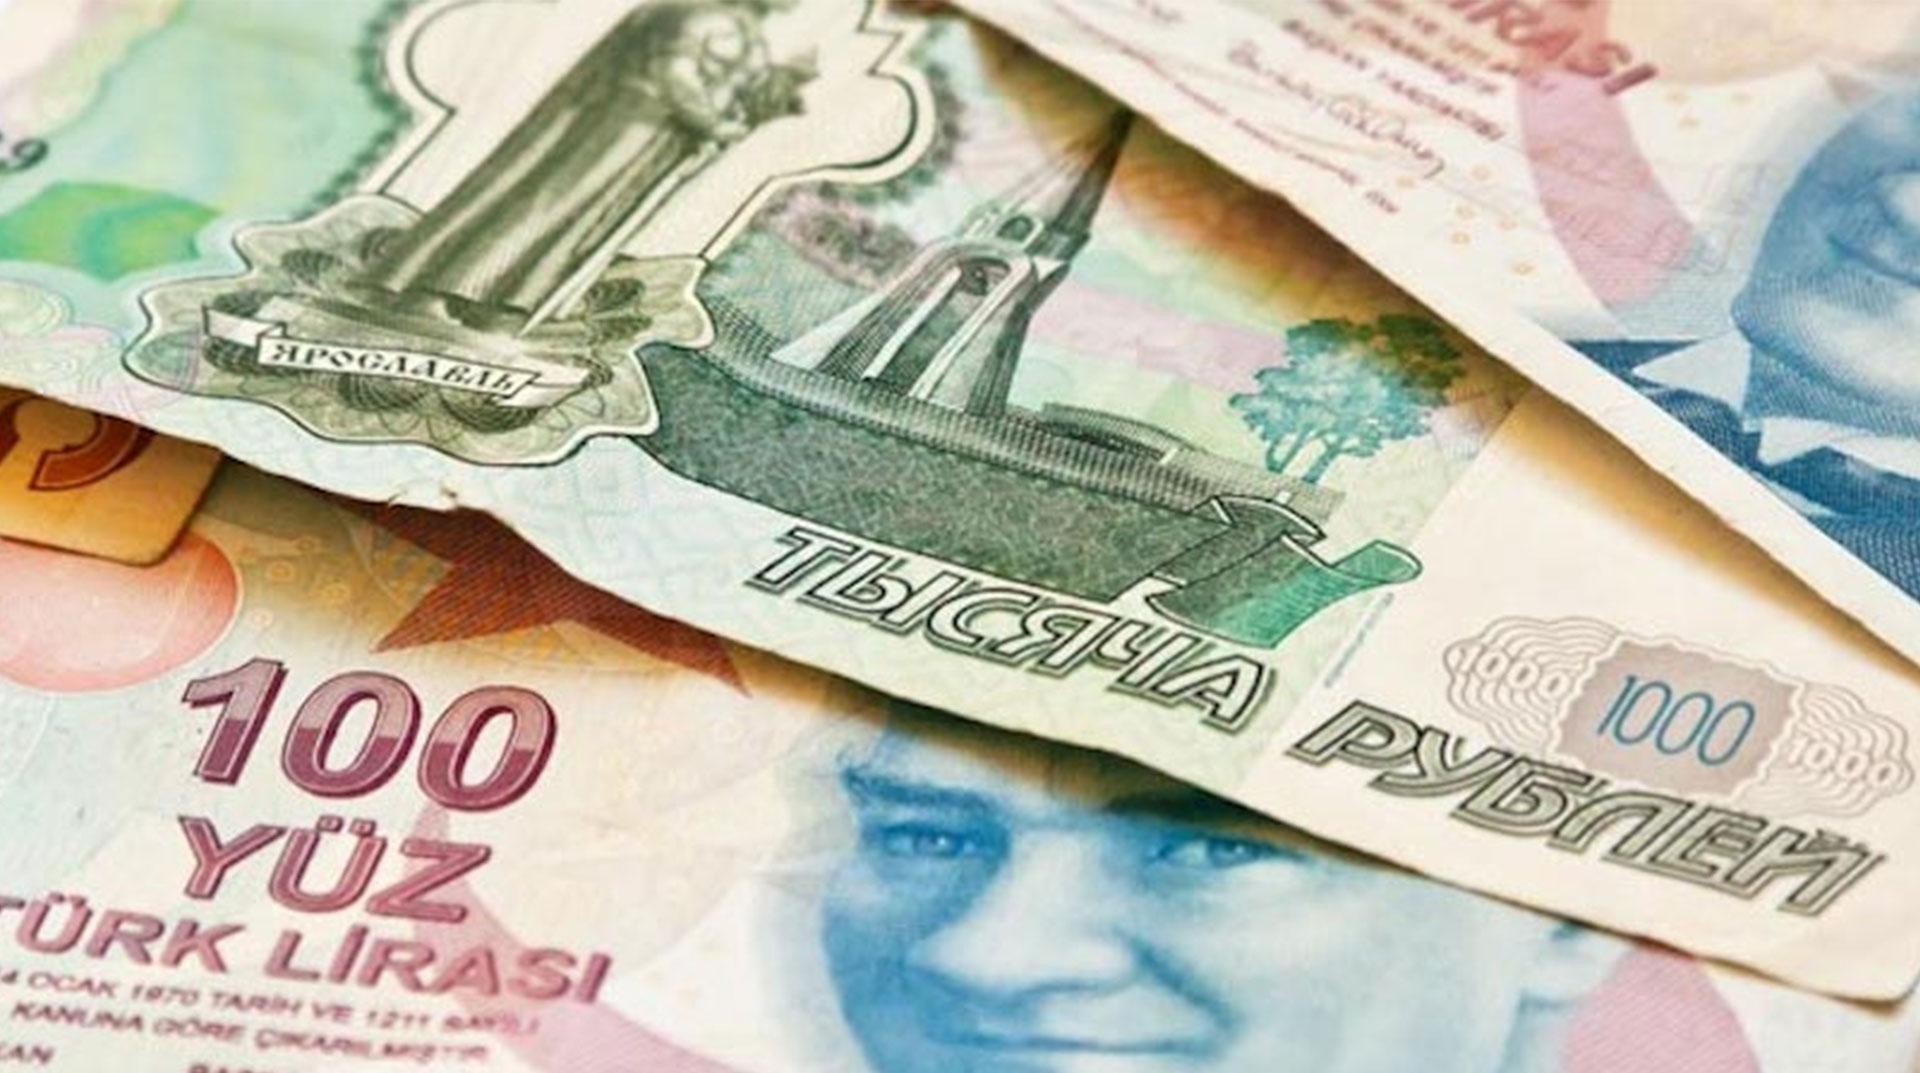 Rusya ile Dolara Karşı Anlaşma